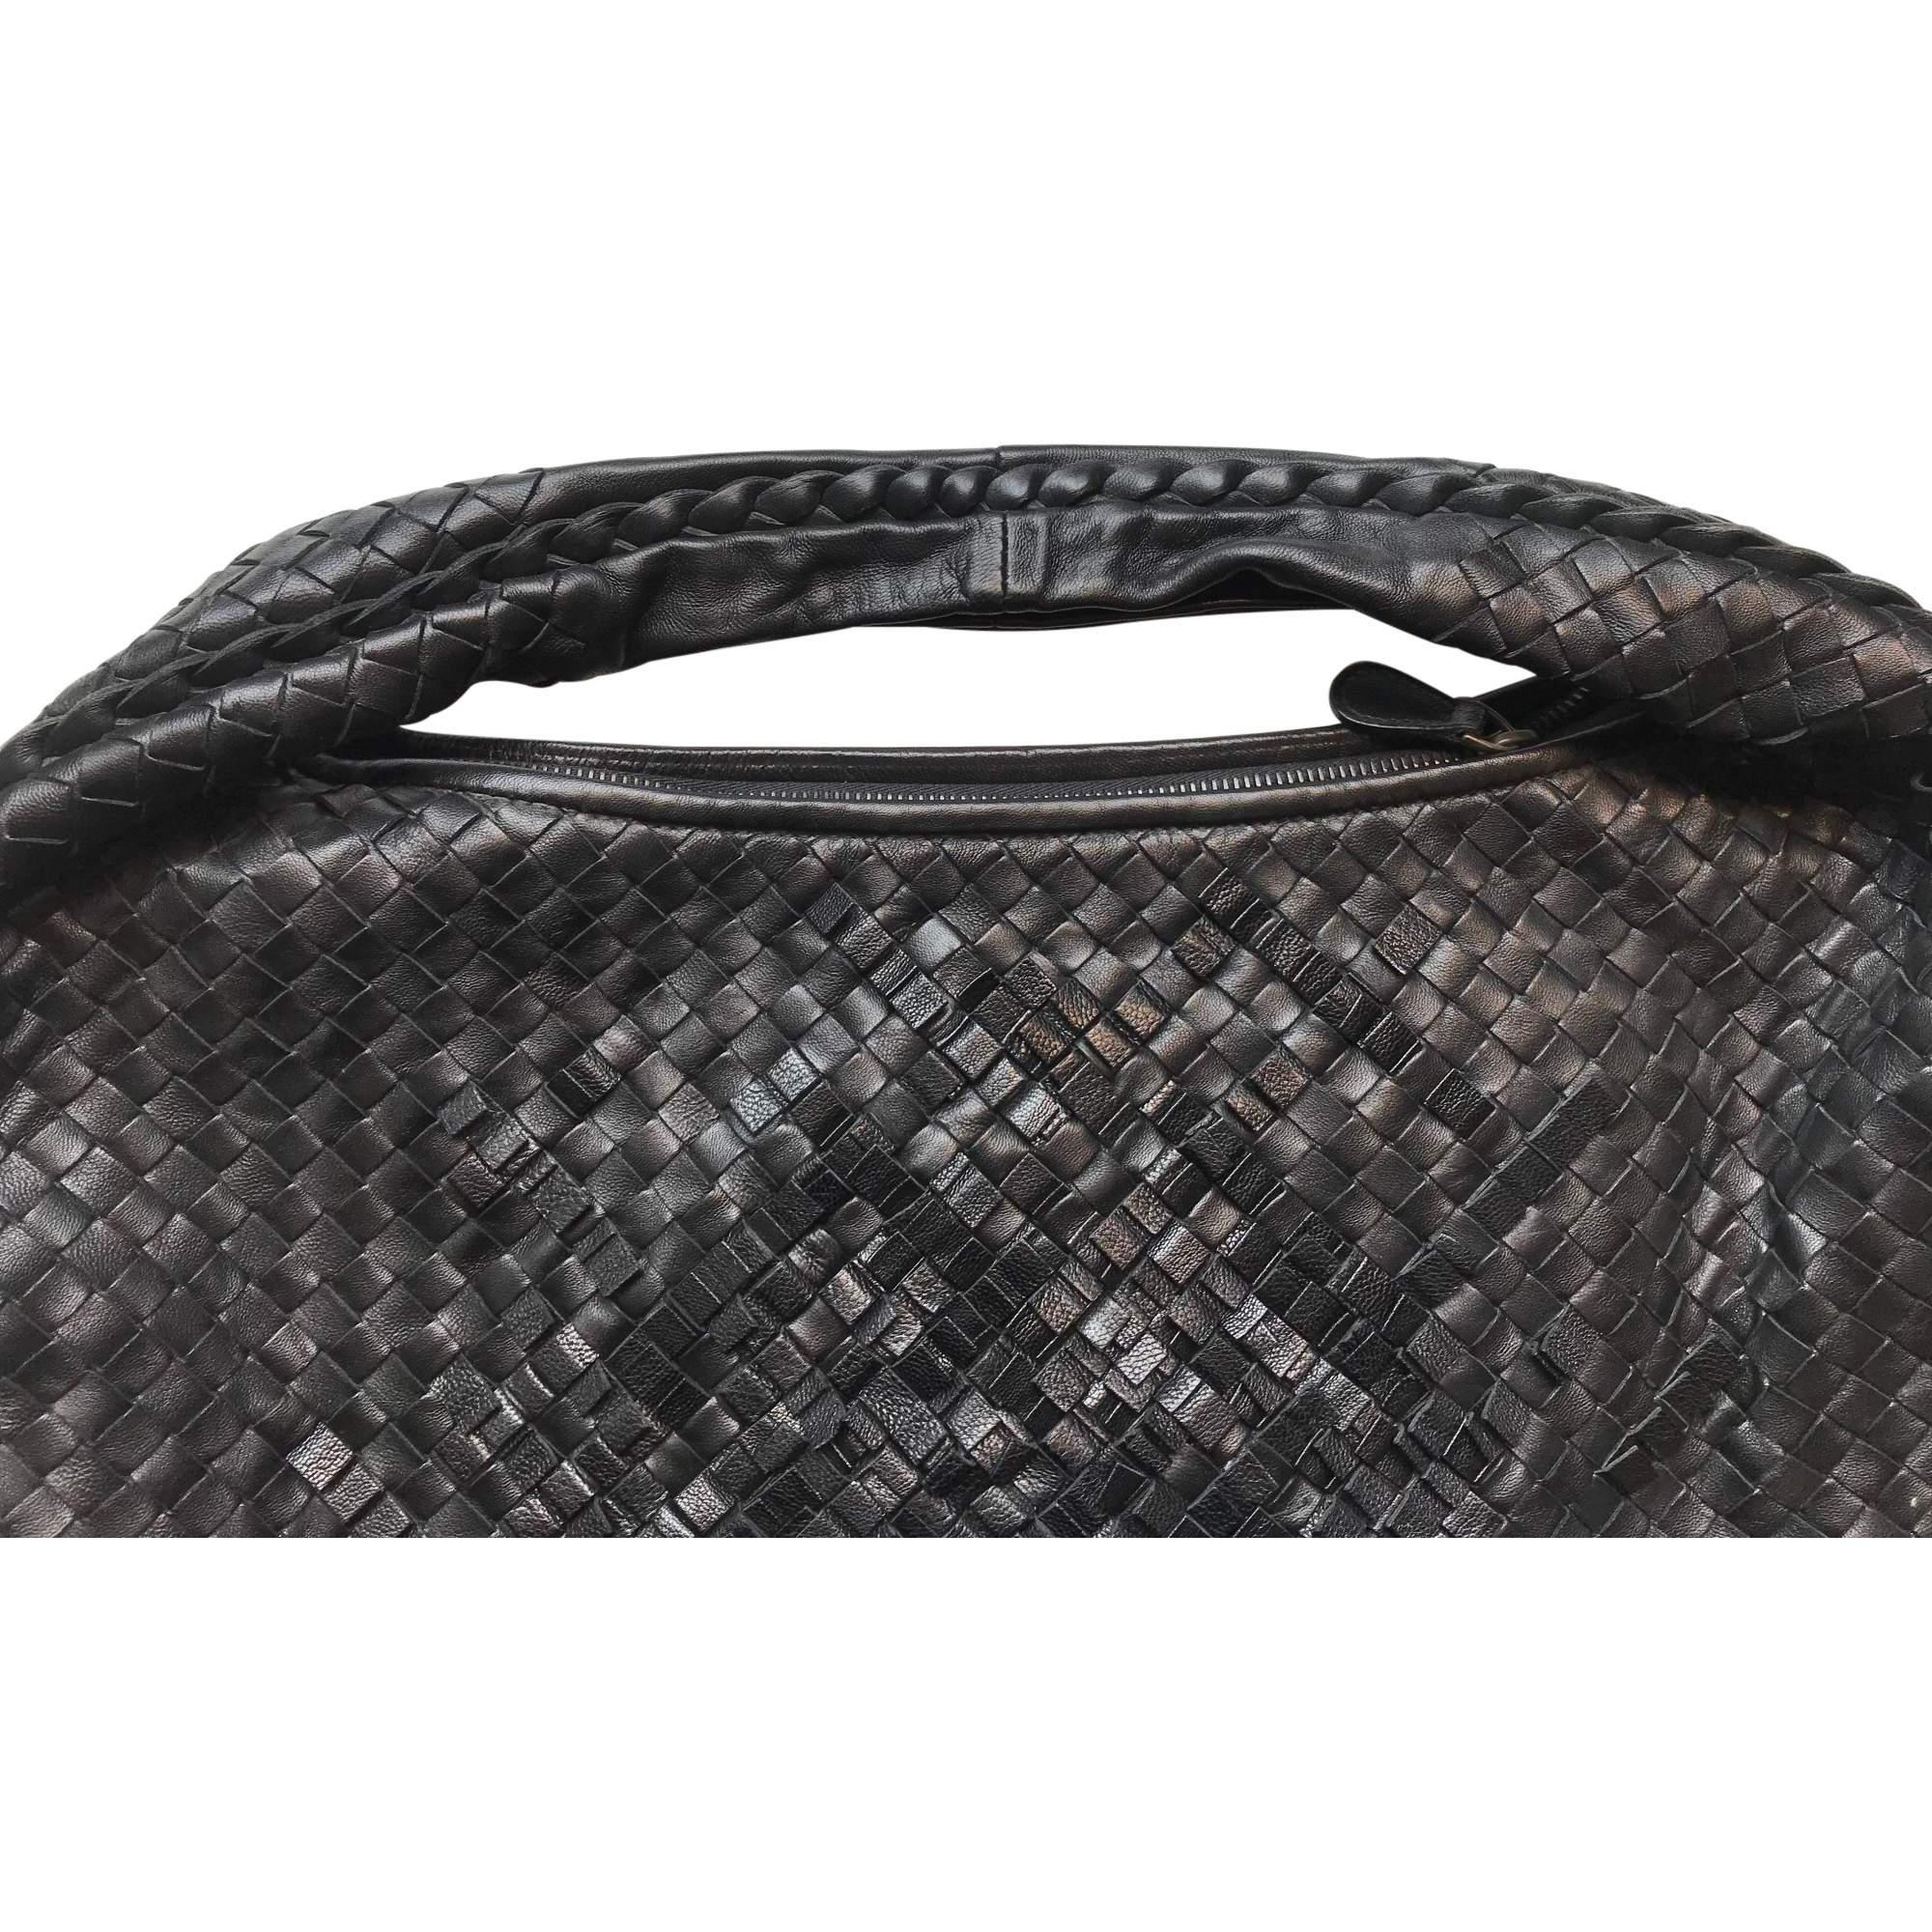 fd6595d5b67c Bottega Veneta Black Leather Basket Weave Handbag